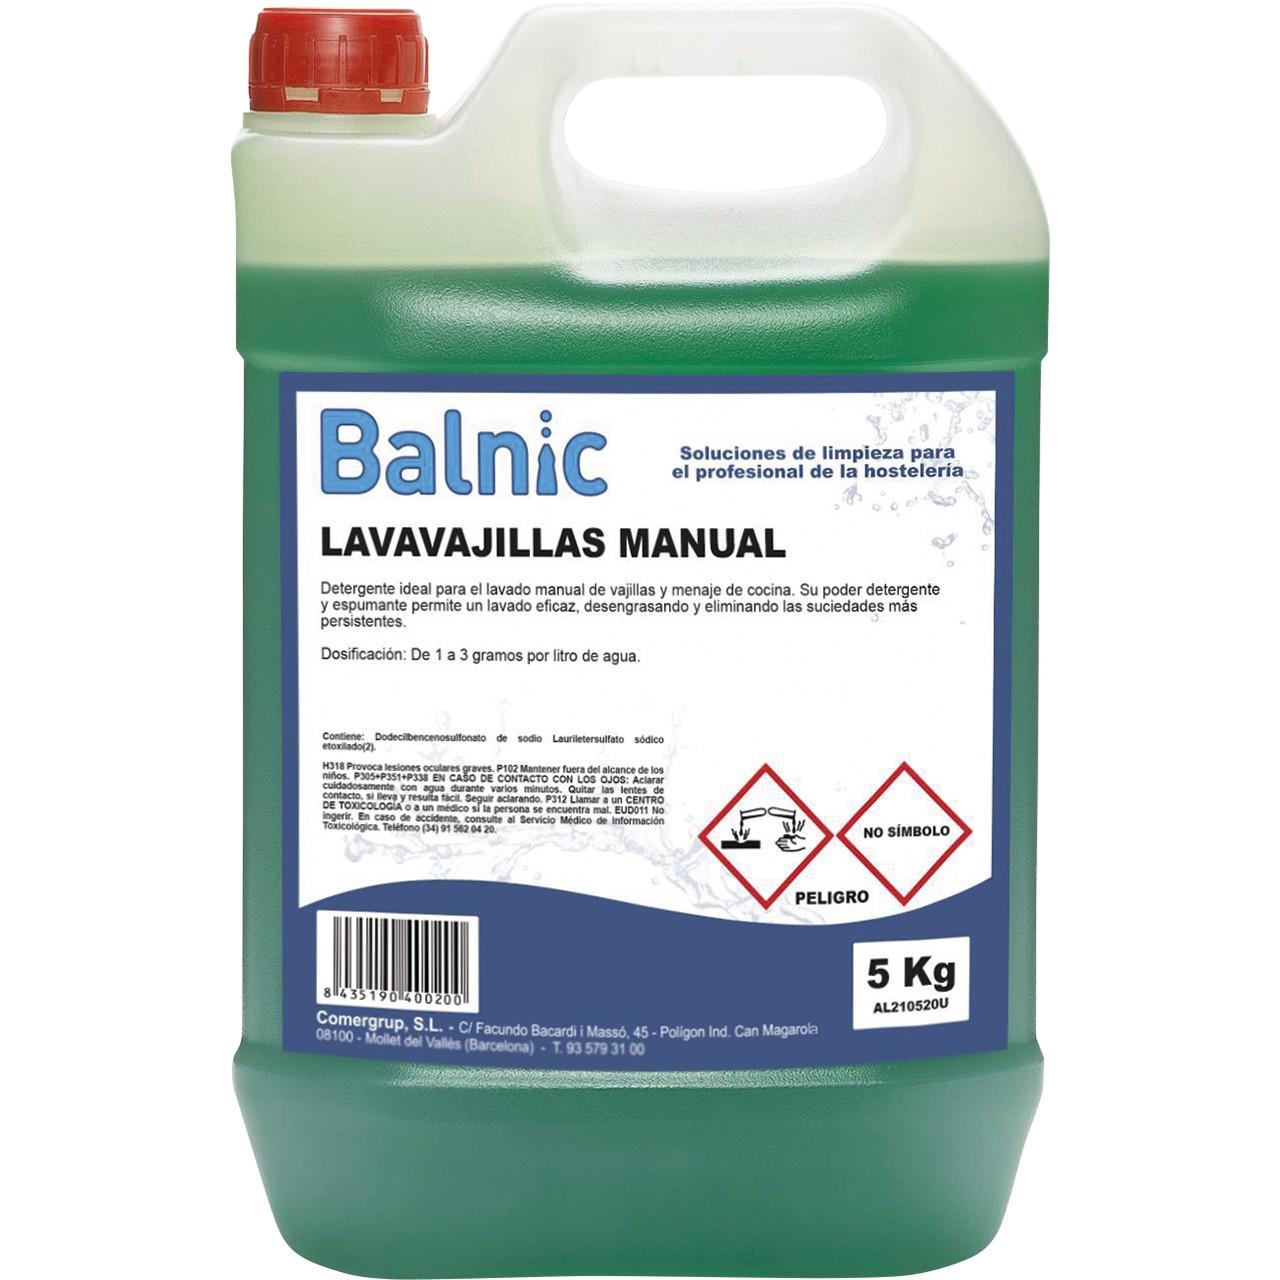 Balnic rentavaixelles manual